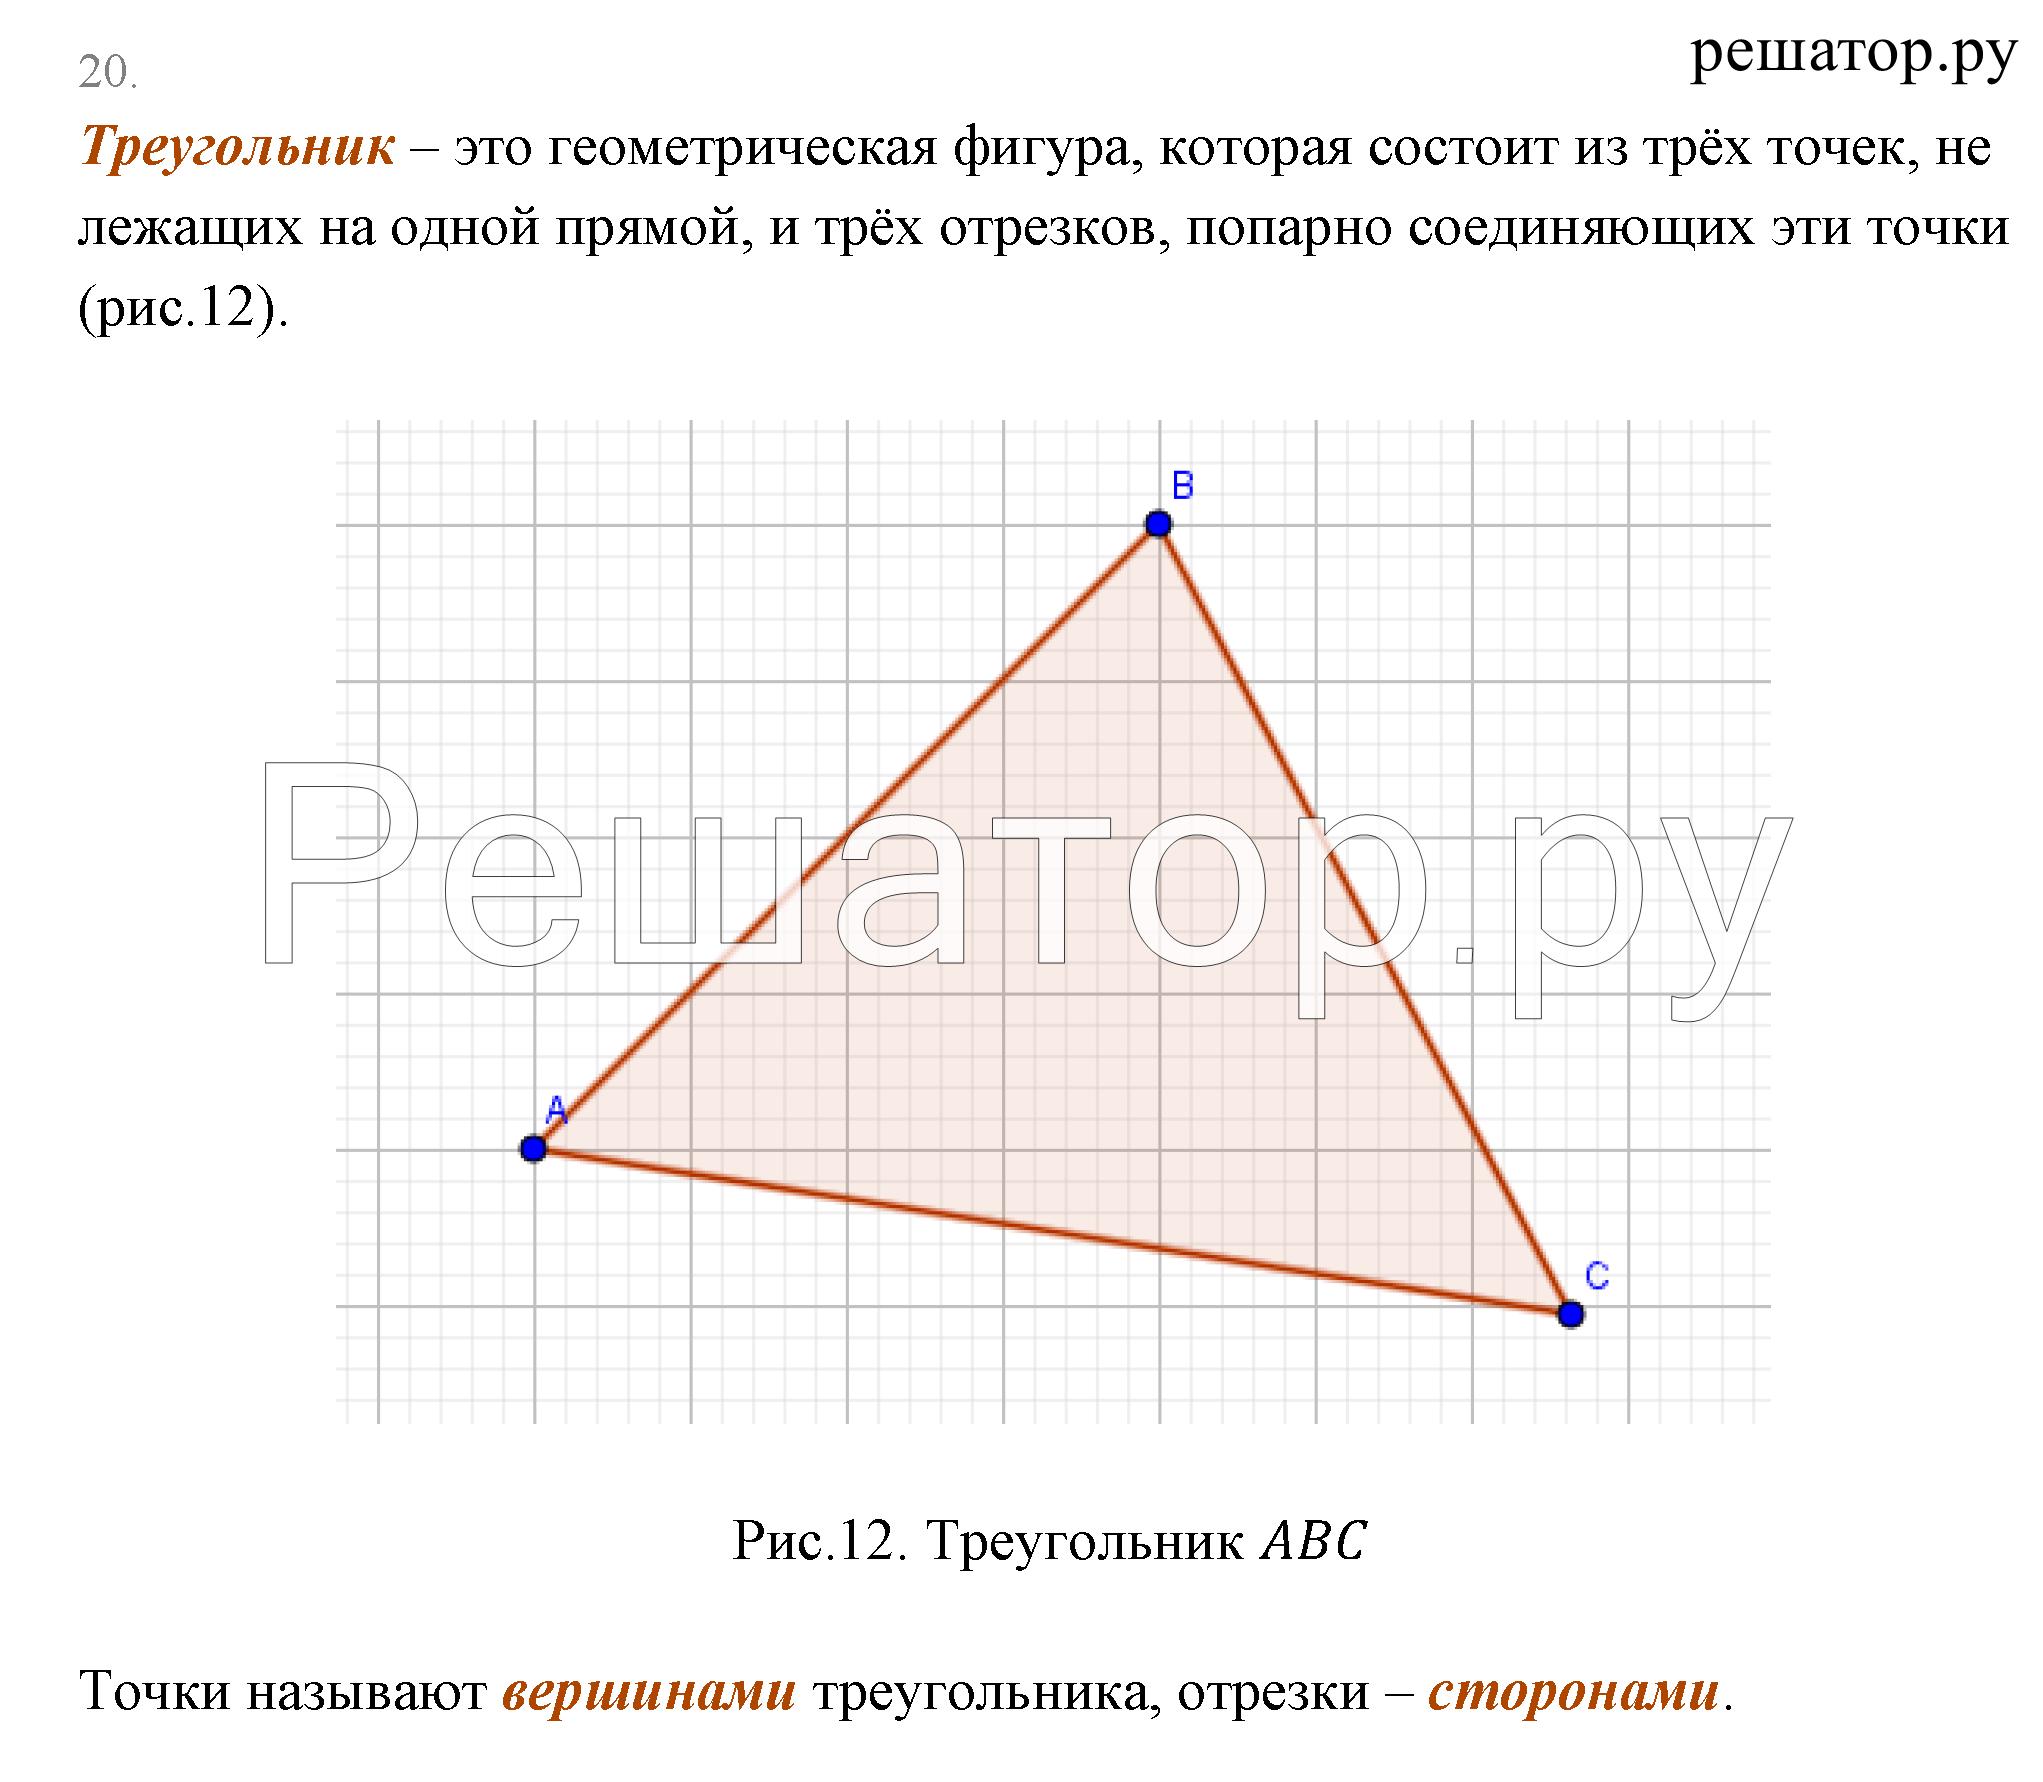 ГДЗ по геометрии класс Погорелов решебник онлайн  Задачи 1 2 3 4 5 6 7 8 9 10 11 12 13 14 15 16 17 18 19 20 21